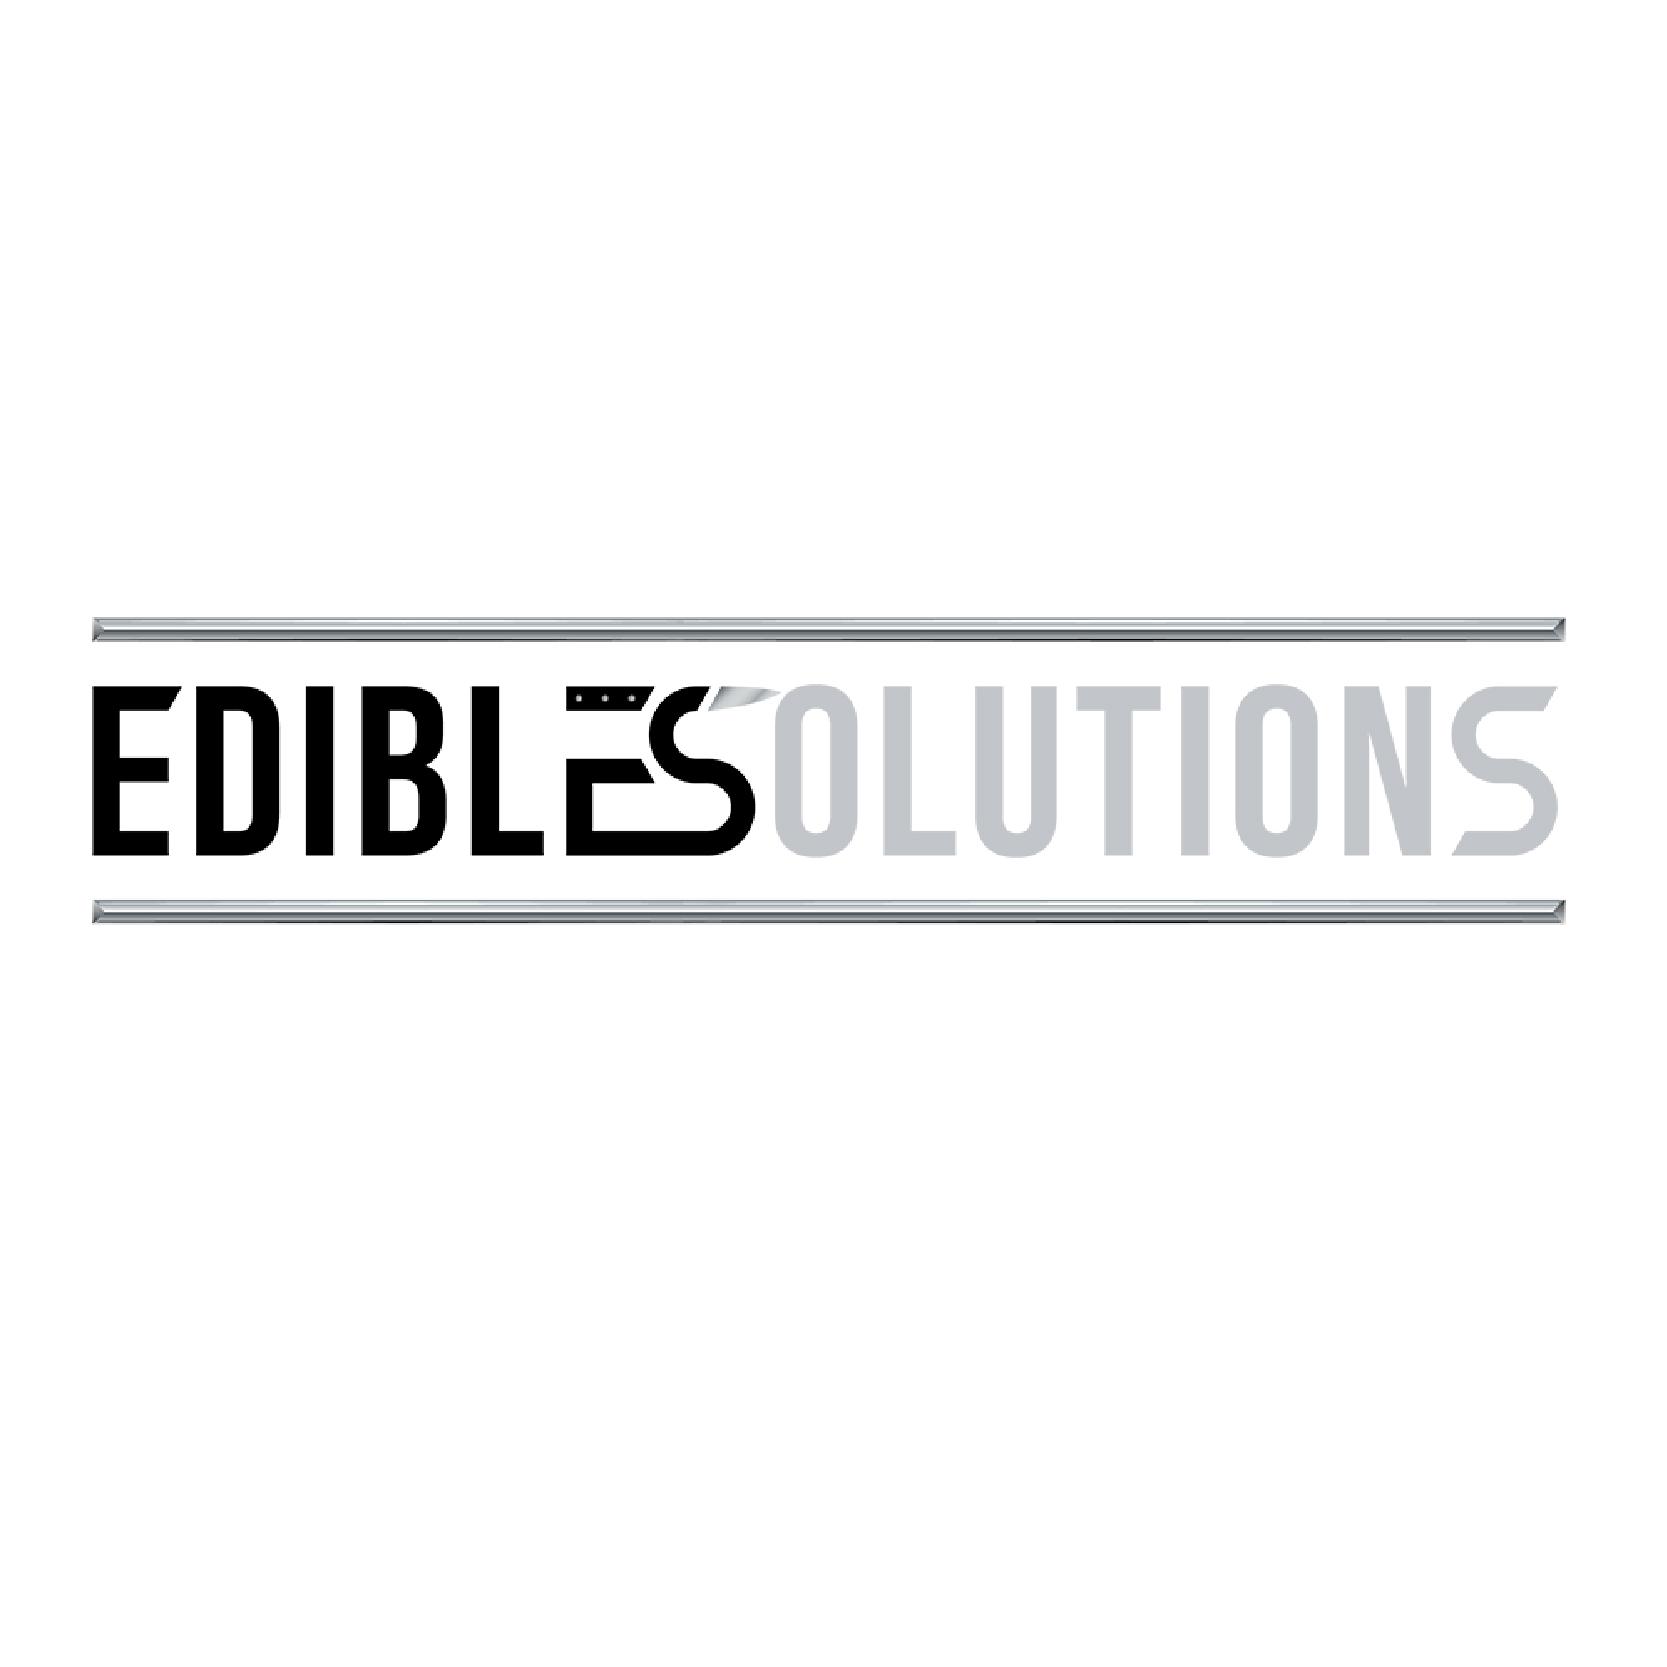 Edible Solutions-01.jpg